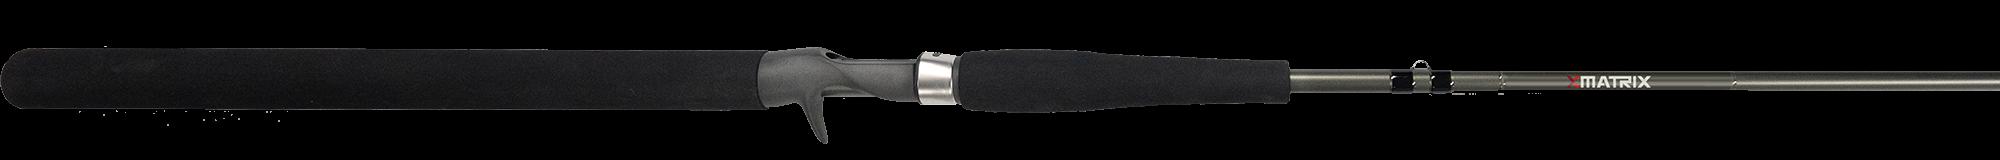 Douglas Outdoors Casting Rods Xmatrix Handle Full Taper